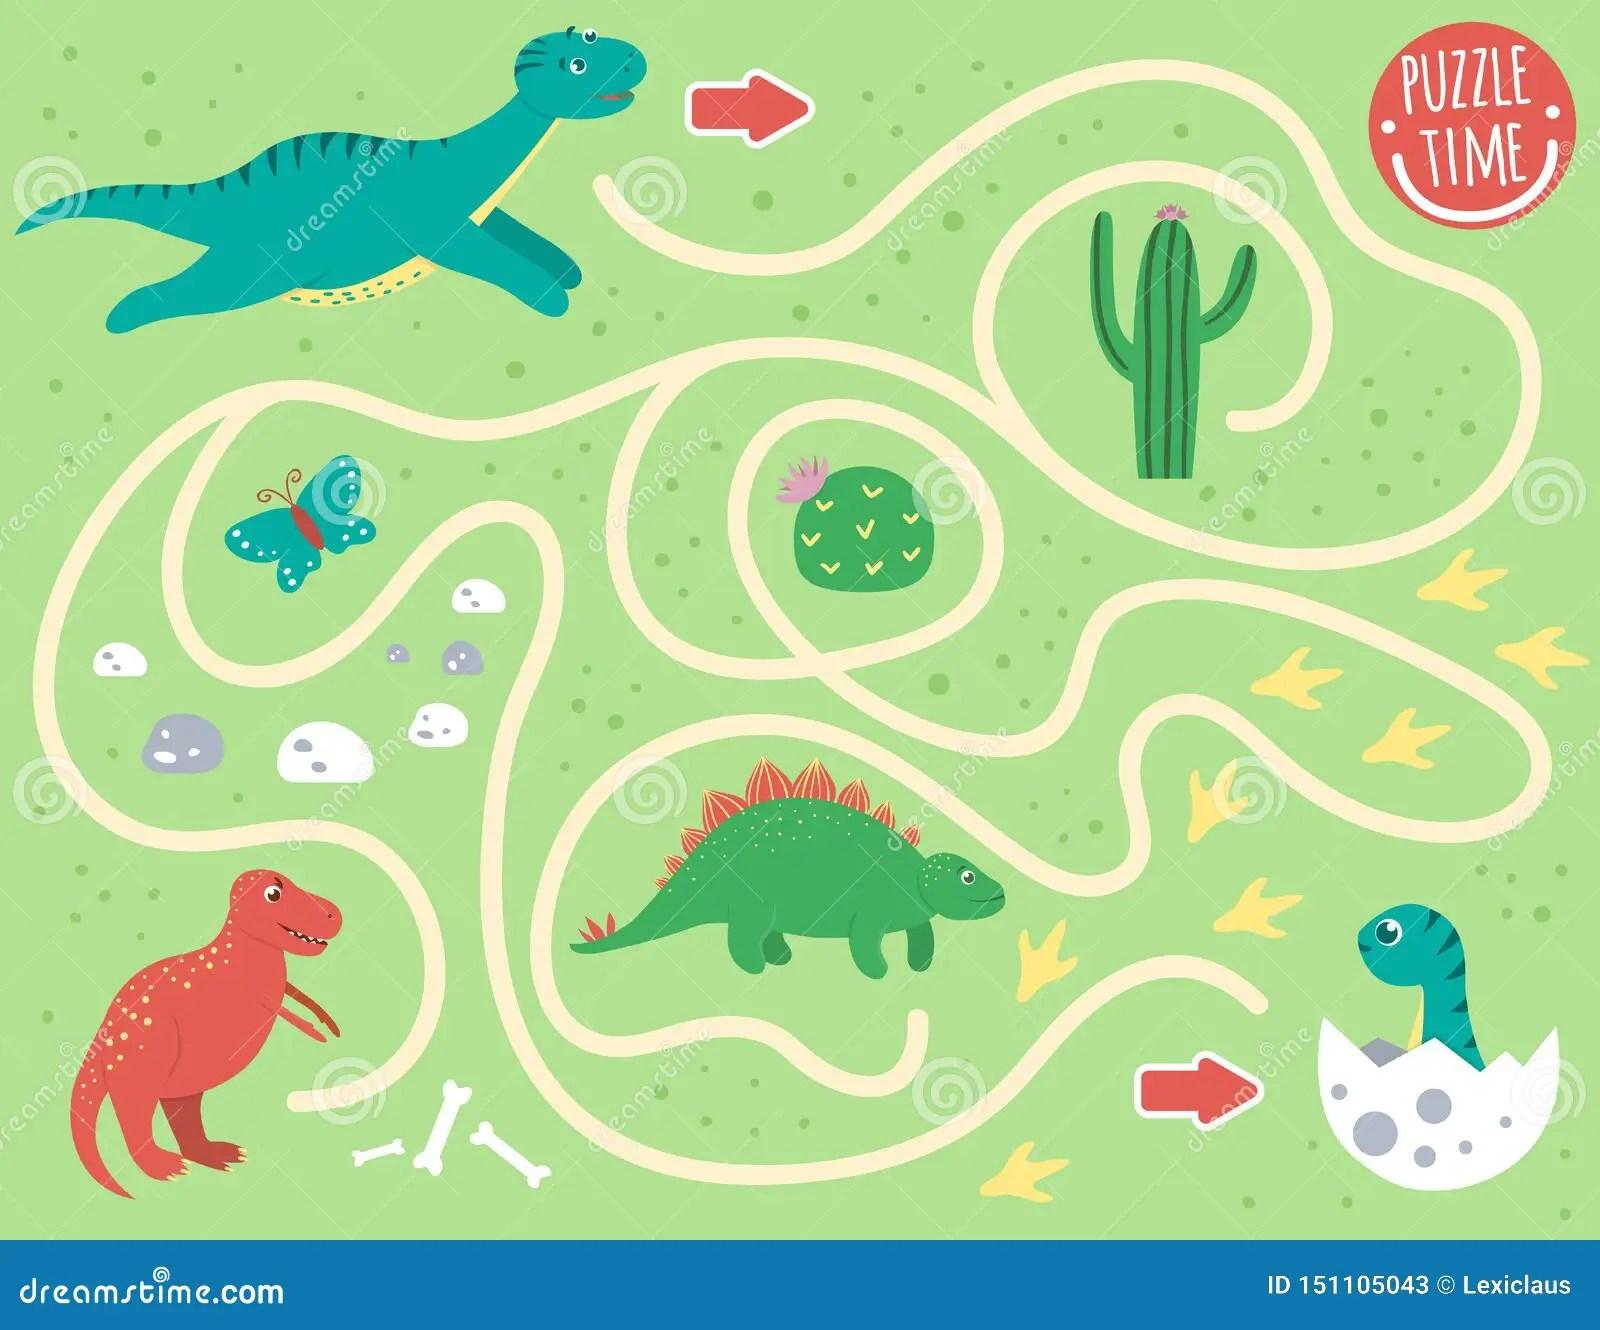 Maze For Children Preschool Activity With Dinosaur Stock